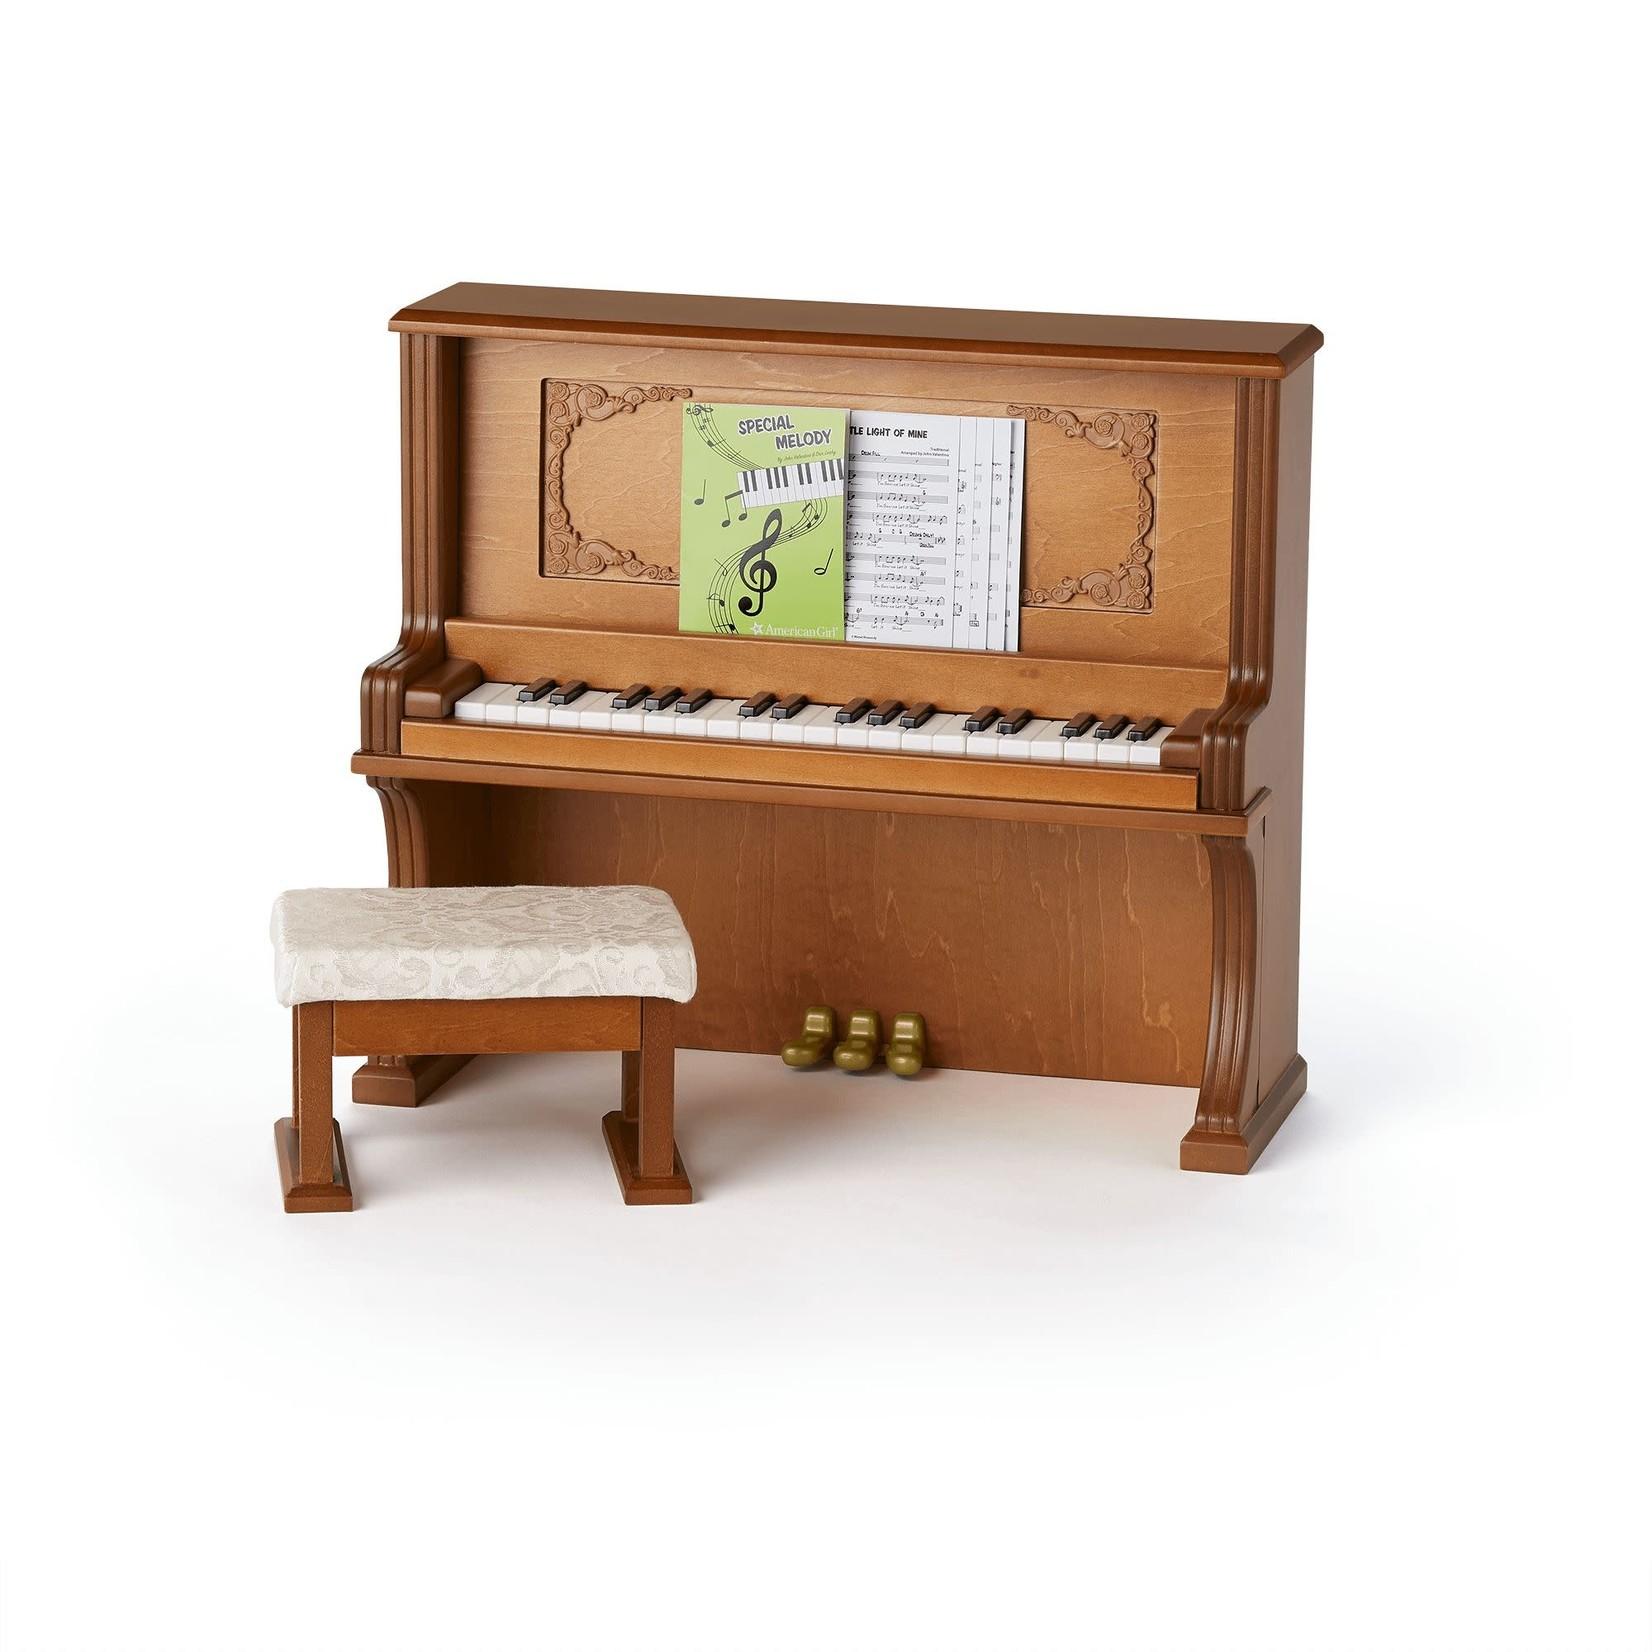 Melody's Upright Piano